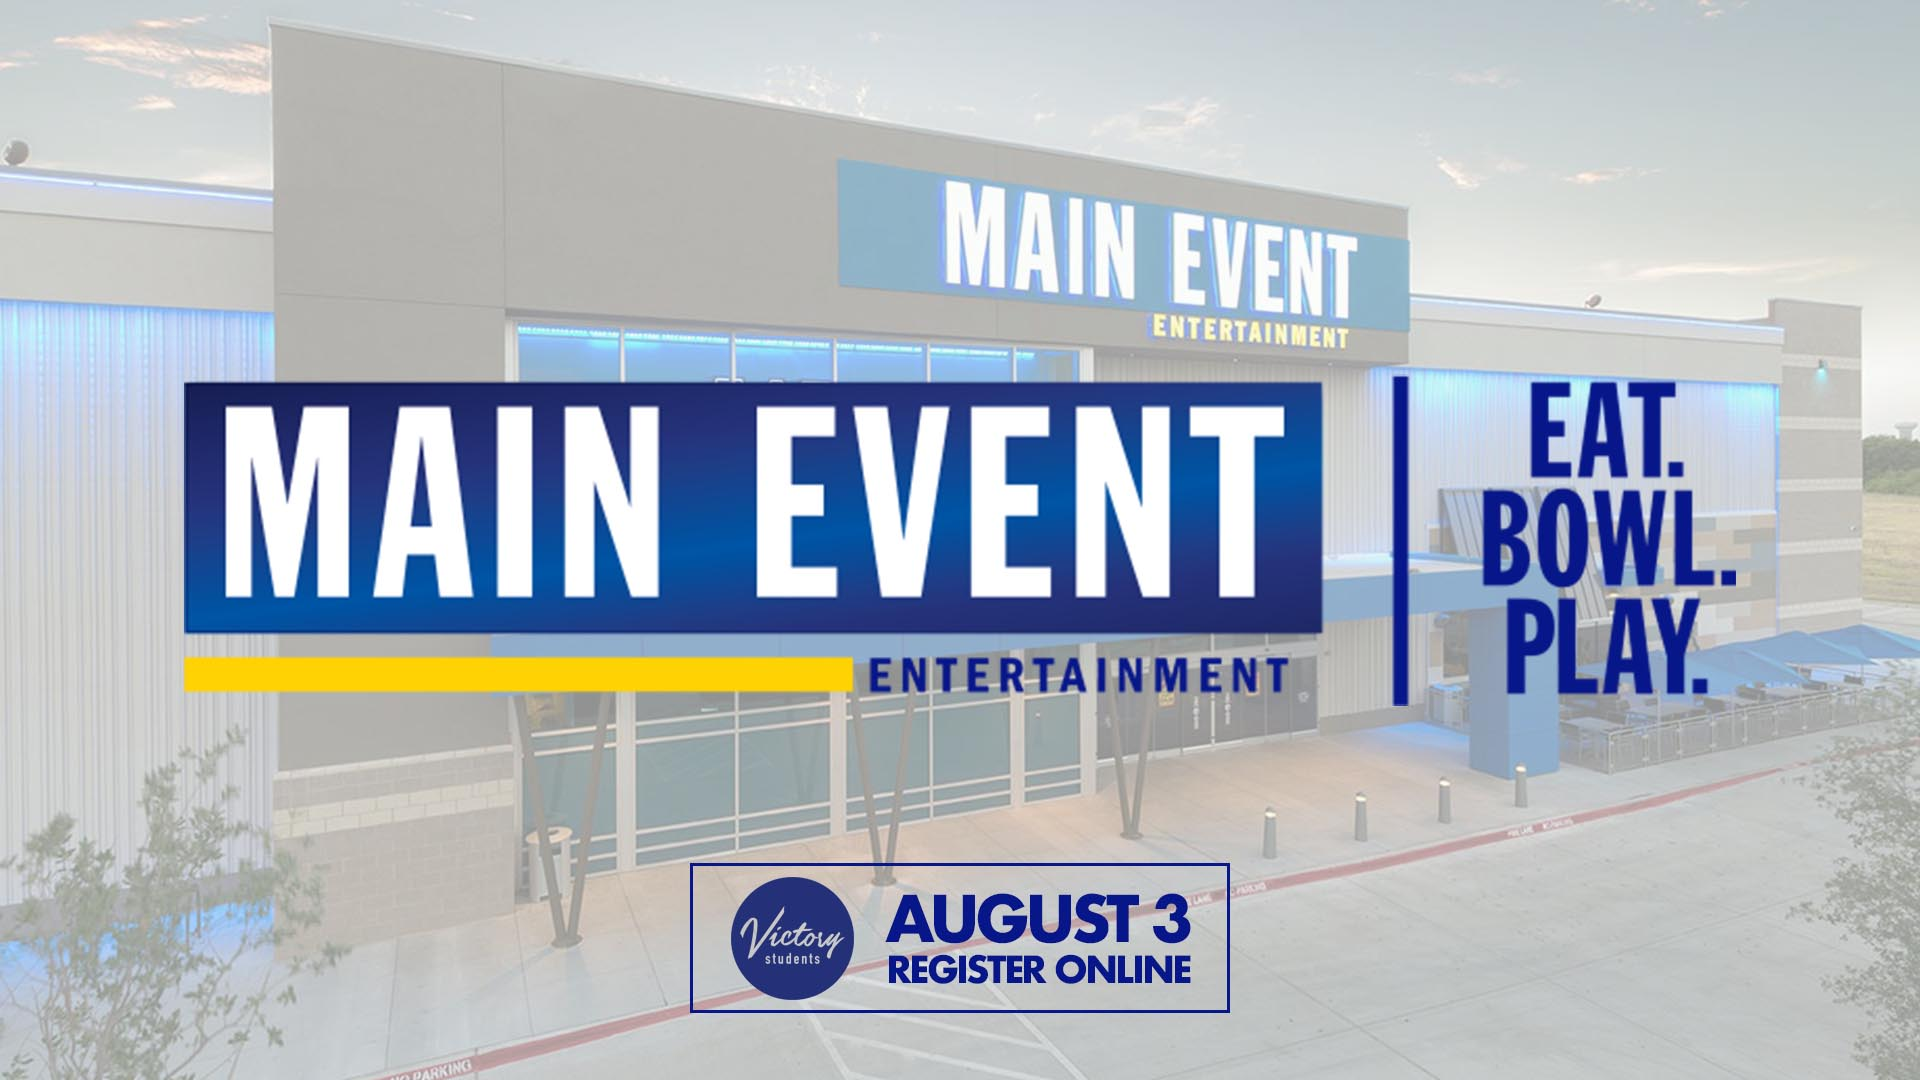 Main event 2018